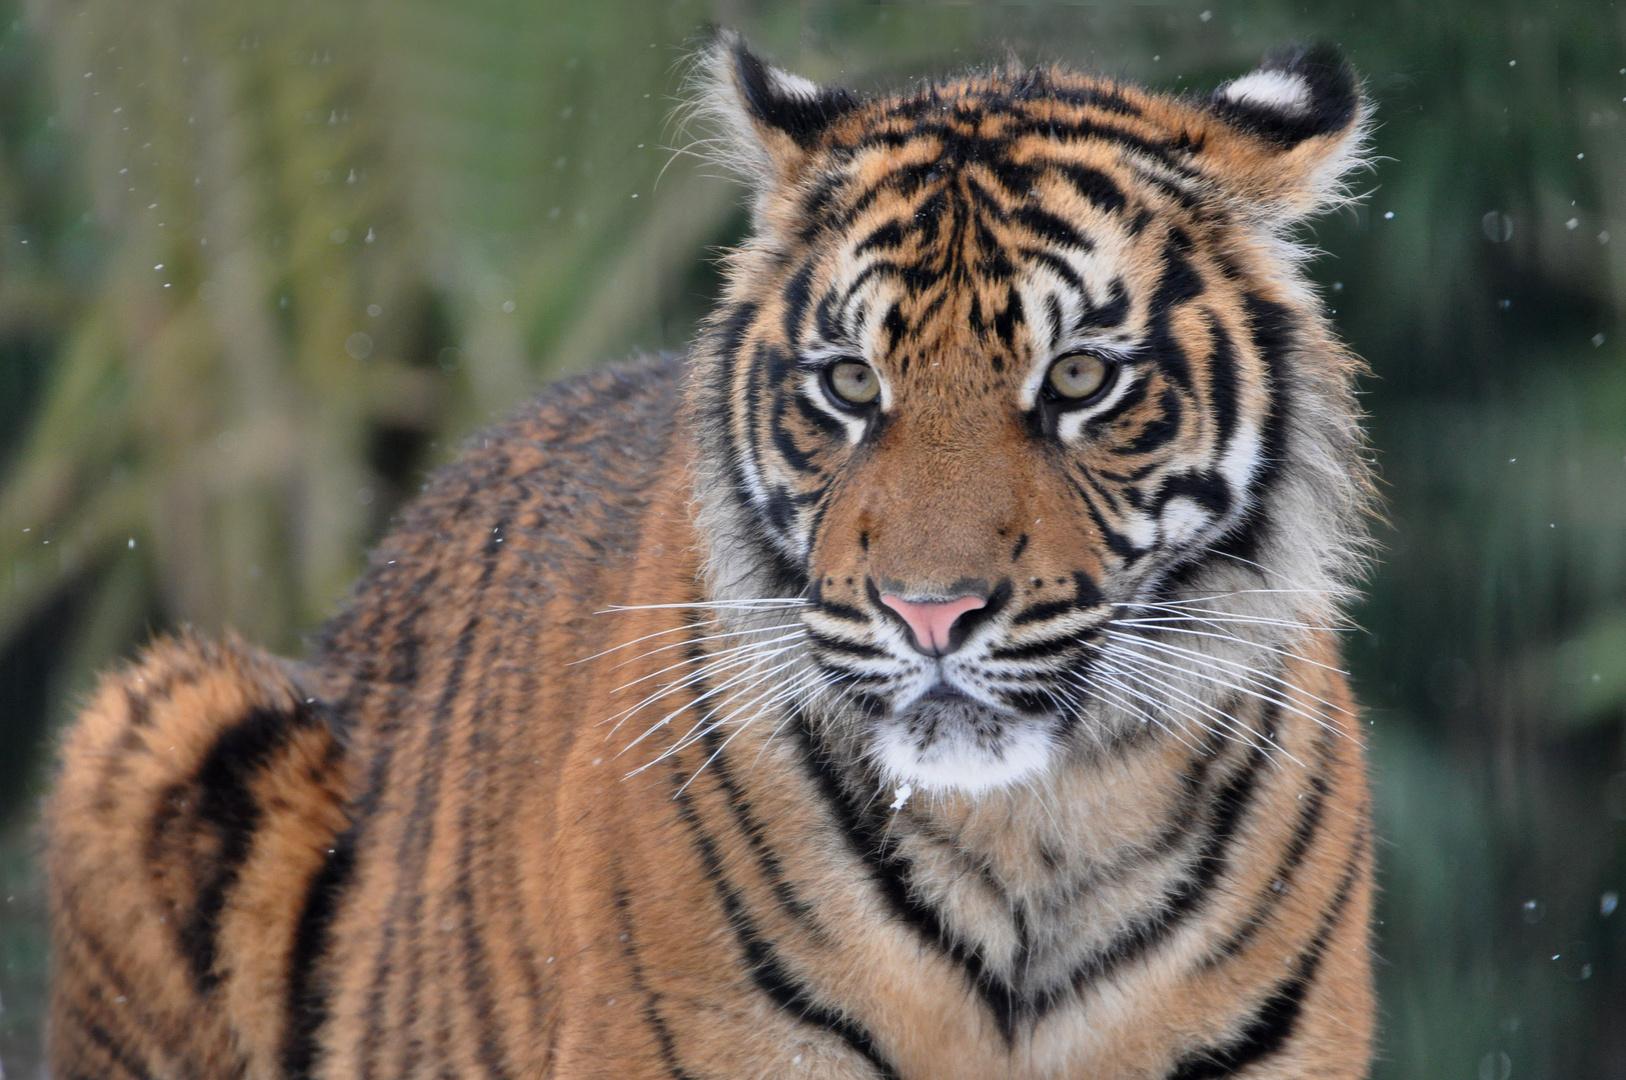 Der Tigerlady ganz nah .....